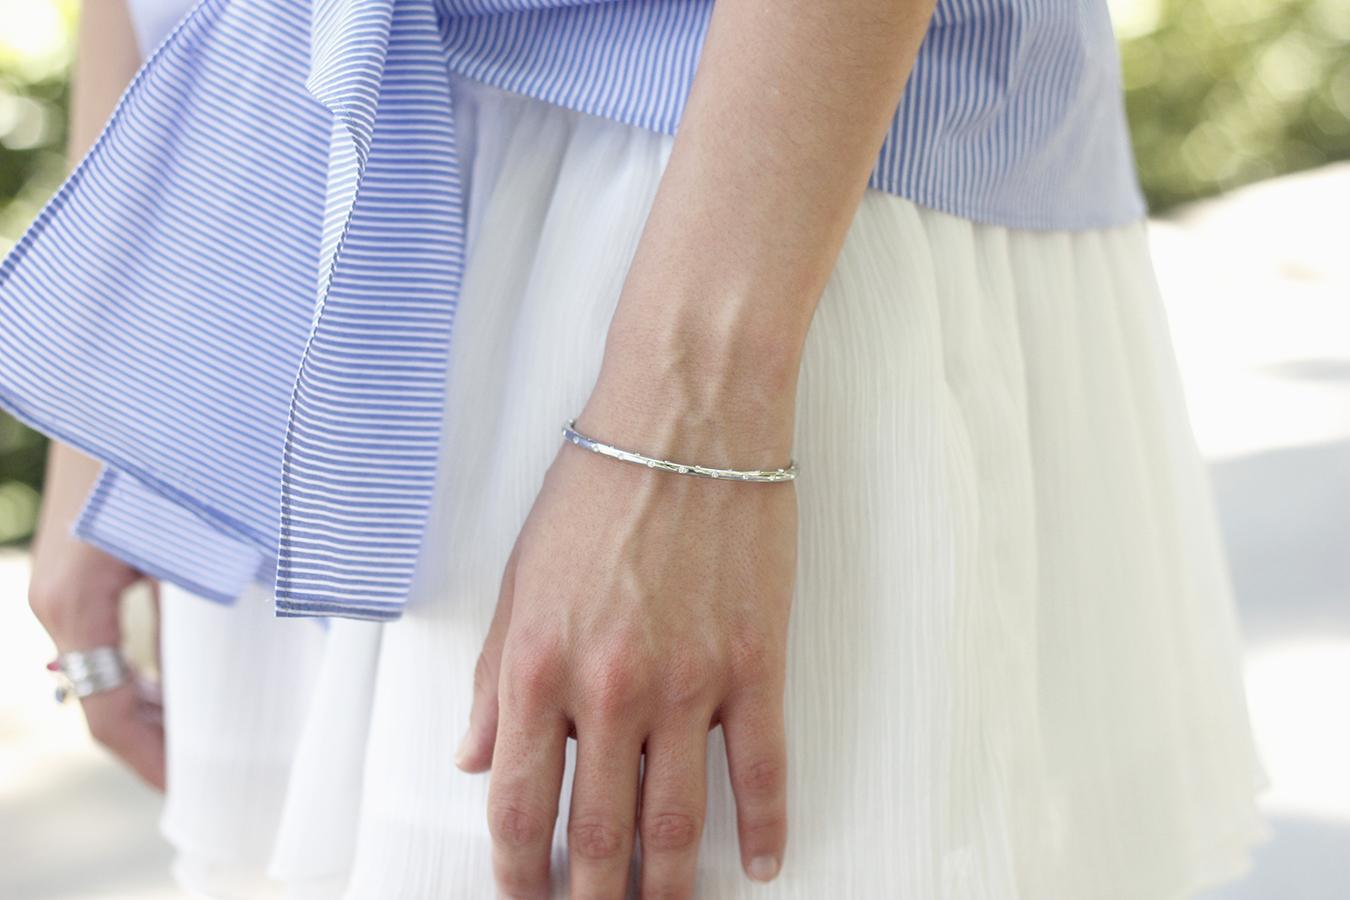 Knotted striped shirt white skirt brosway jewels summer outfit carolina herrera heelsfashion style19